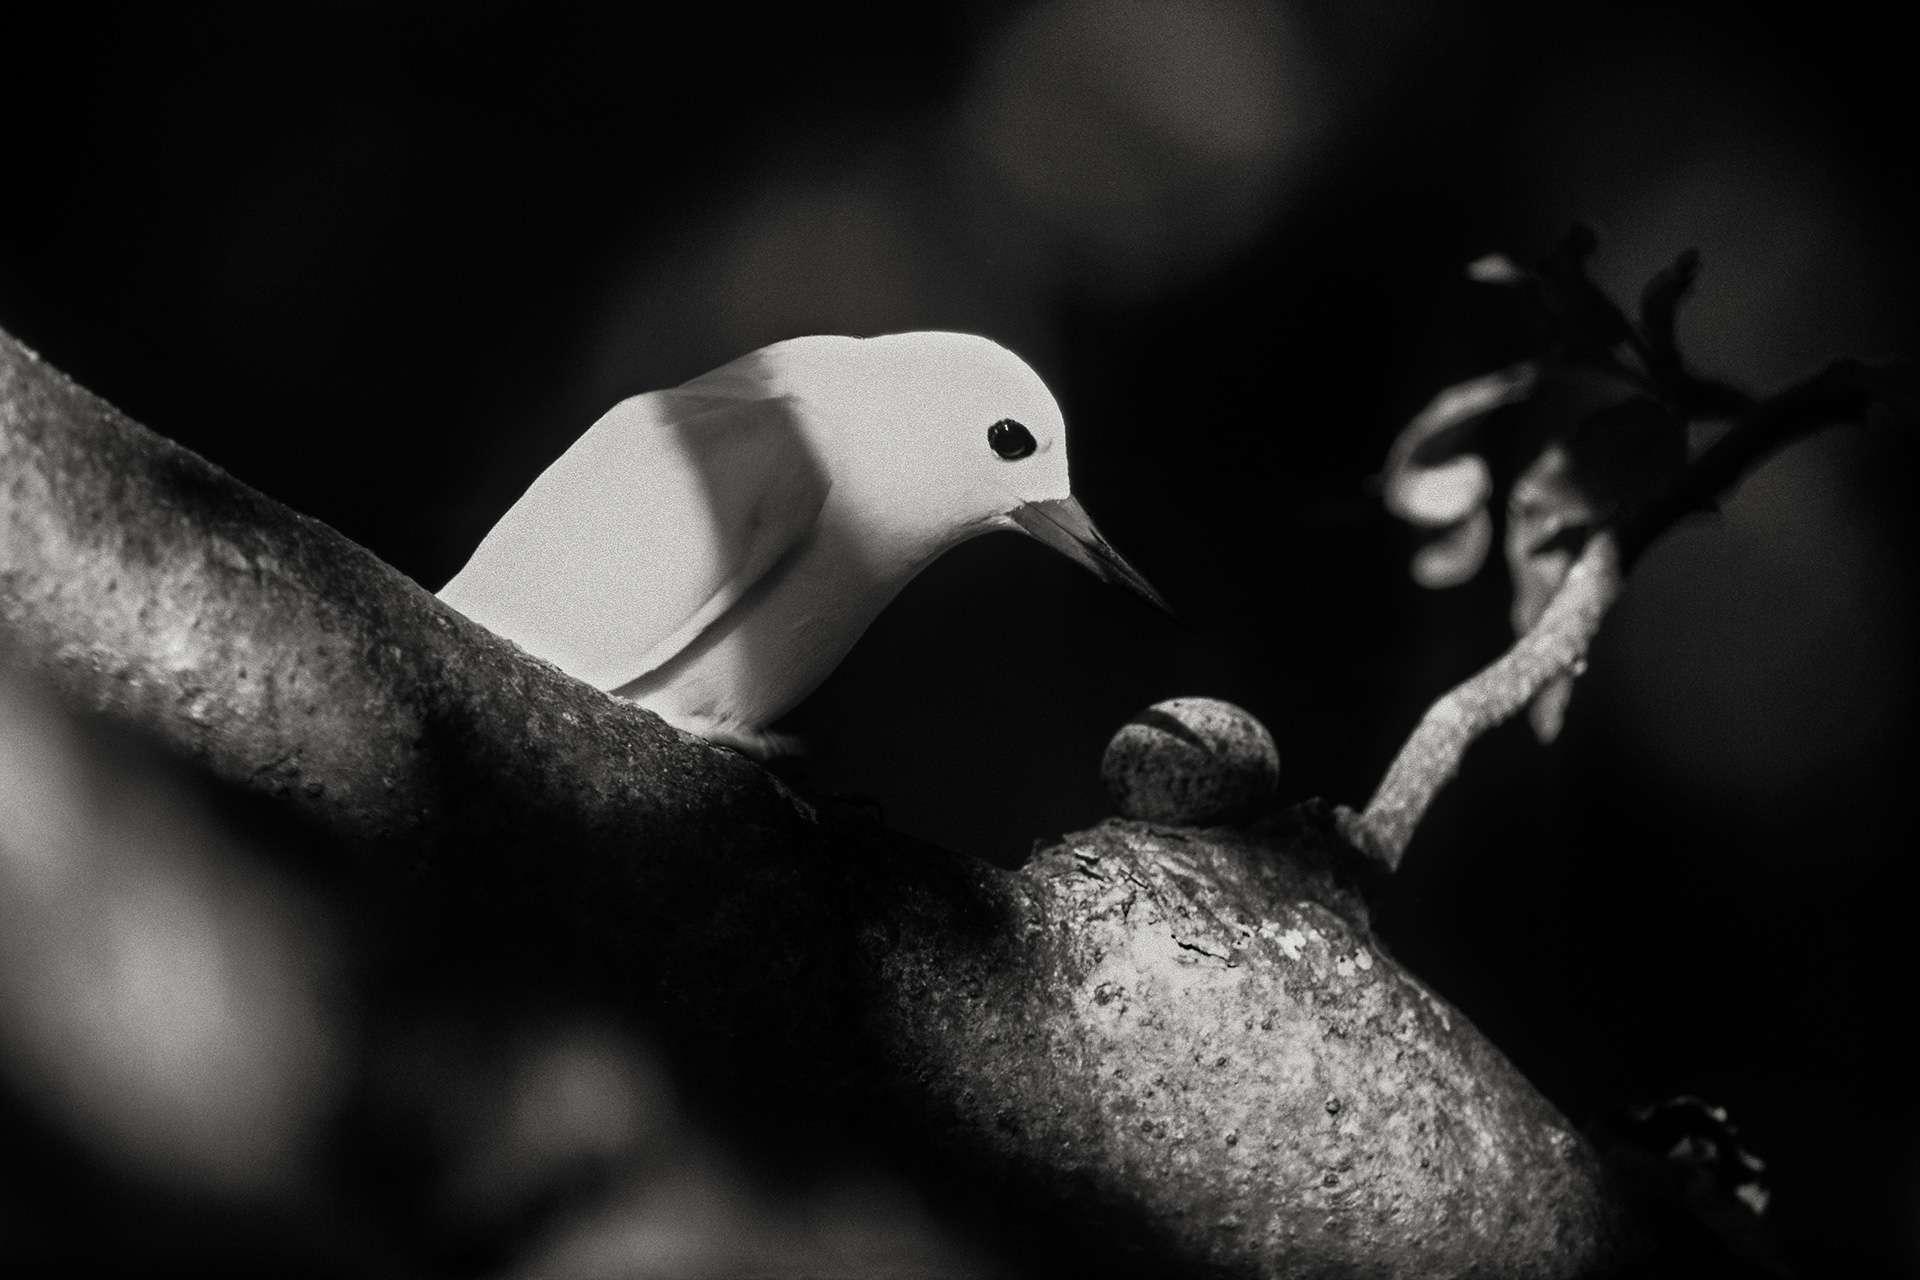 Photographie de Gilles Martin : gygis blanche des Seychelles, Struggle for life